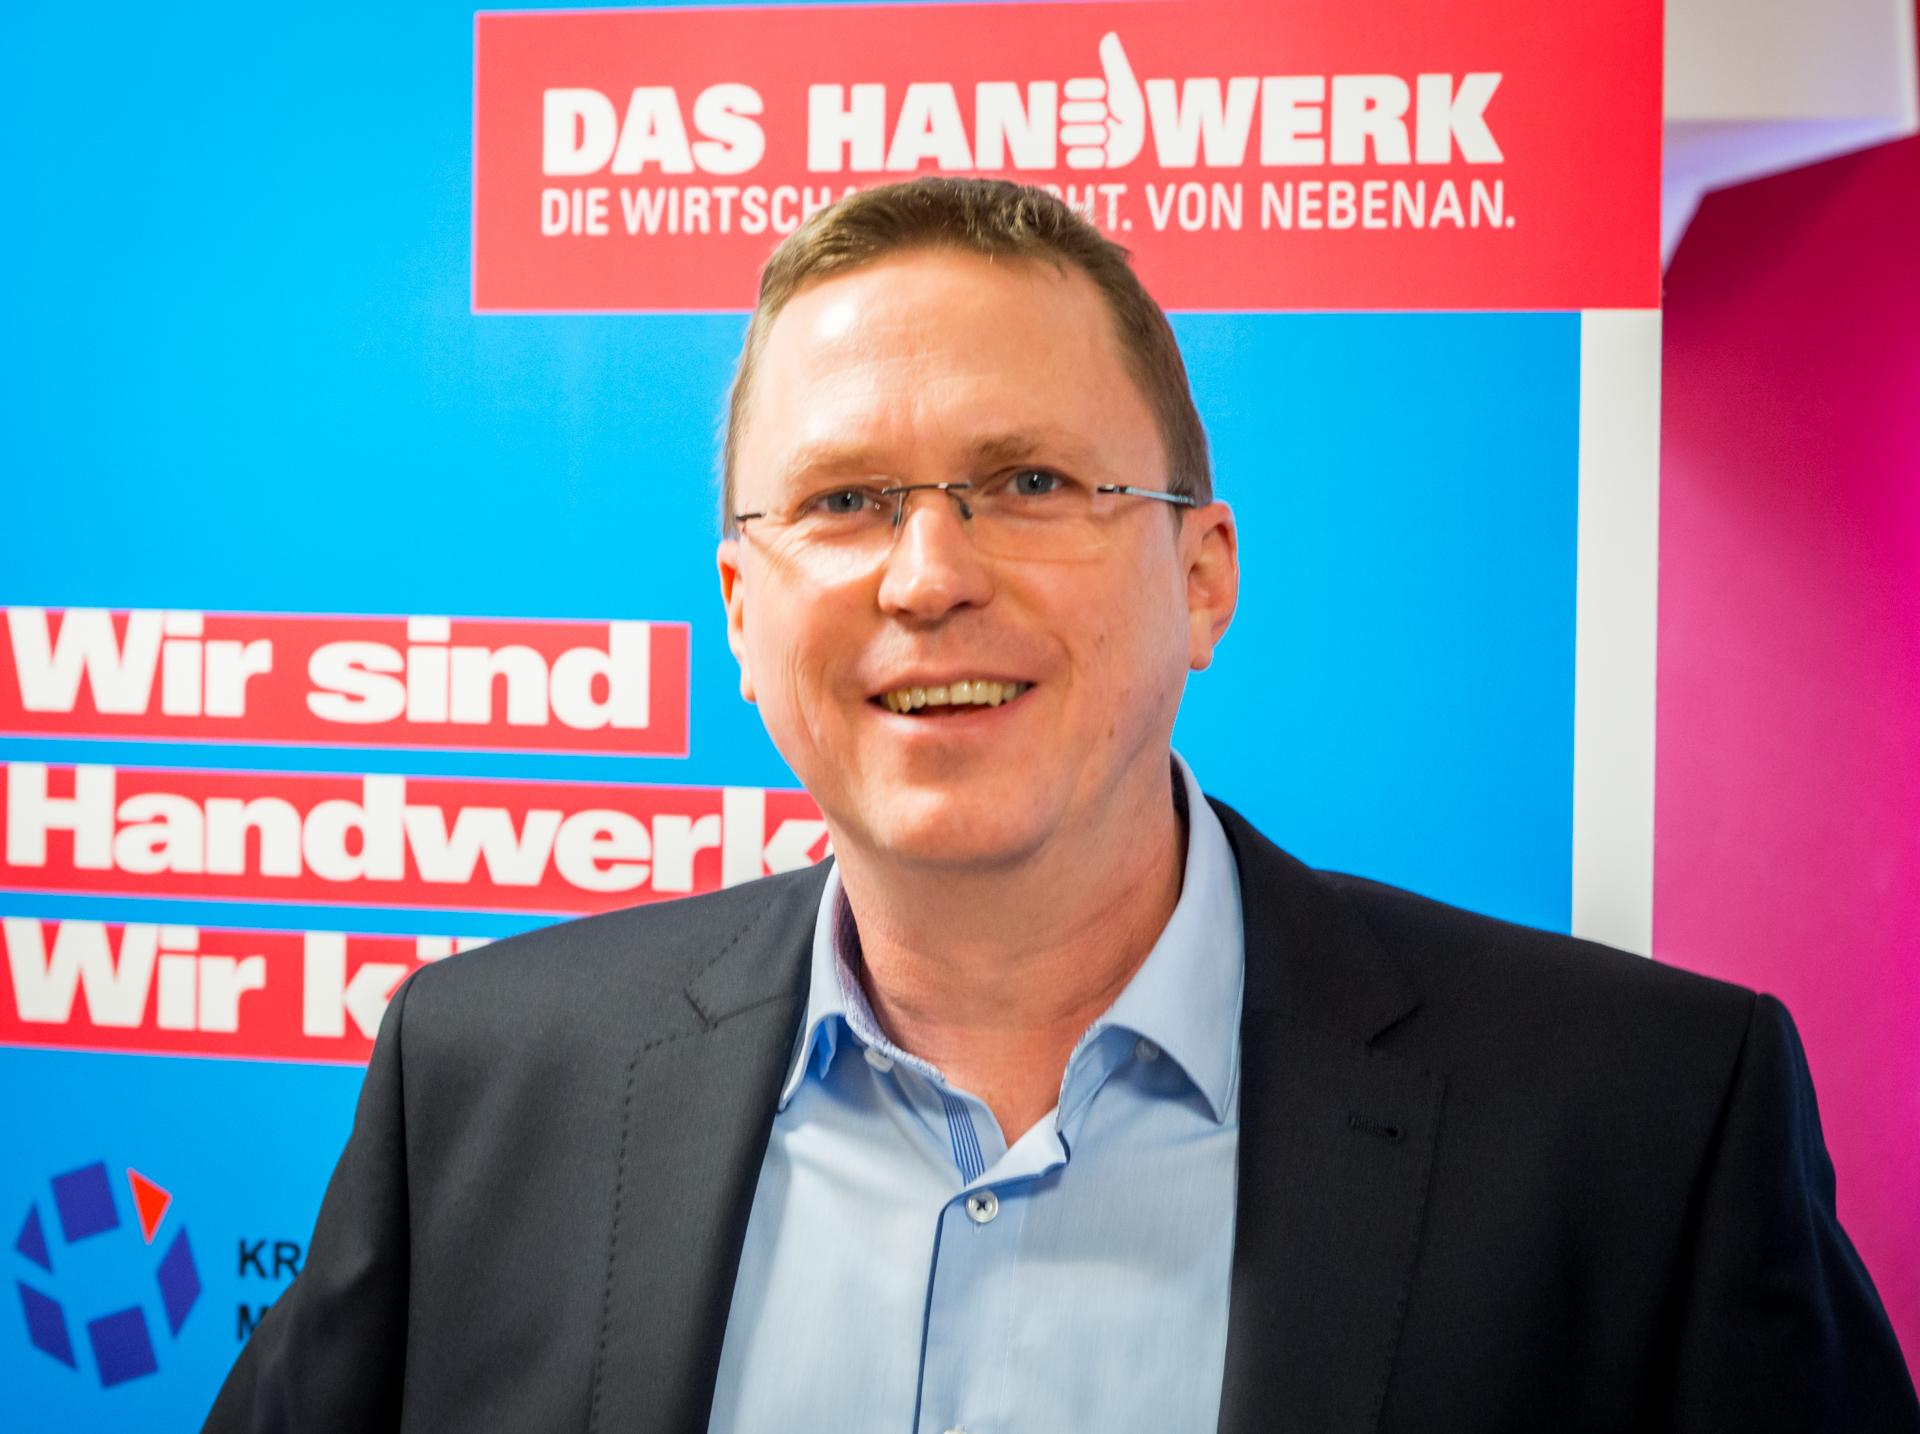 Herr Klaus Molzberger